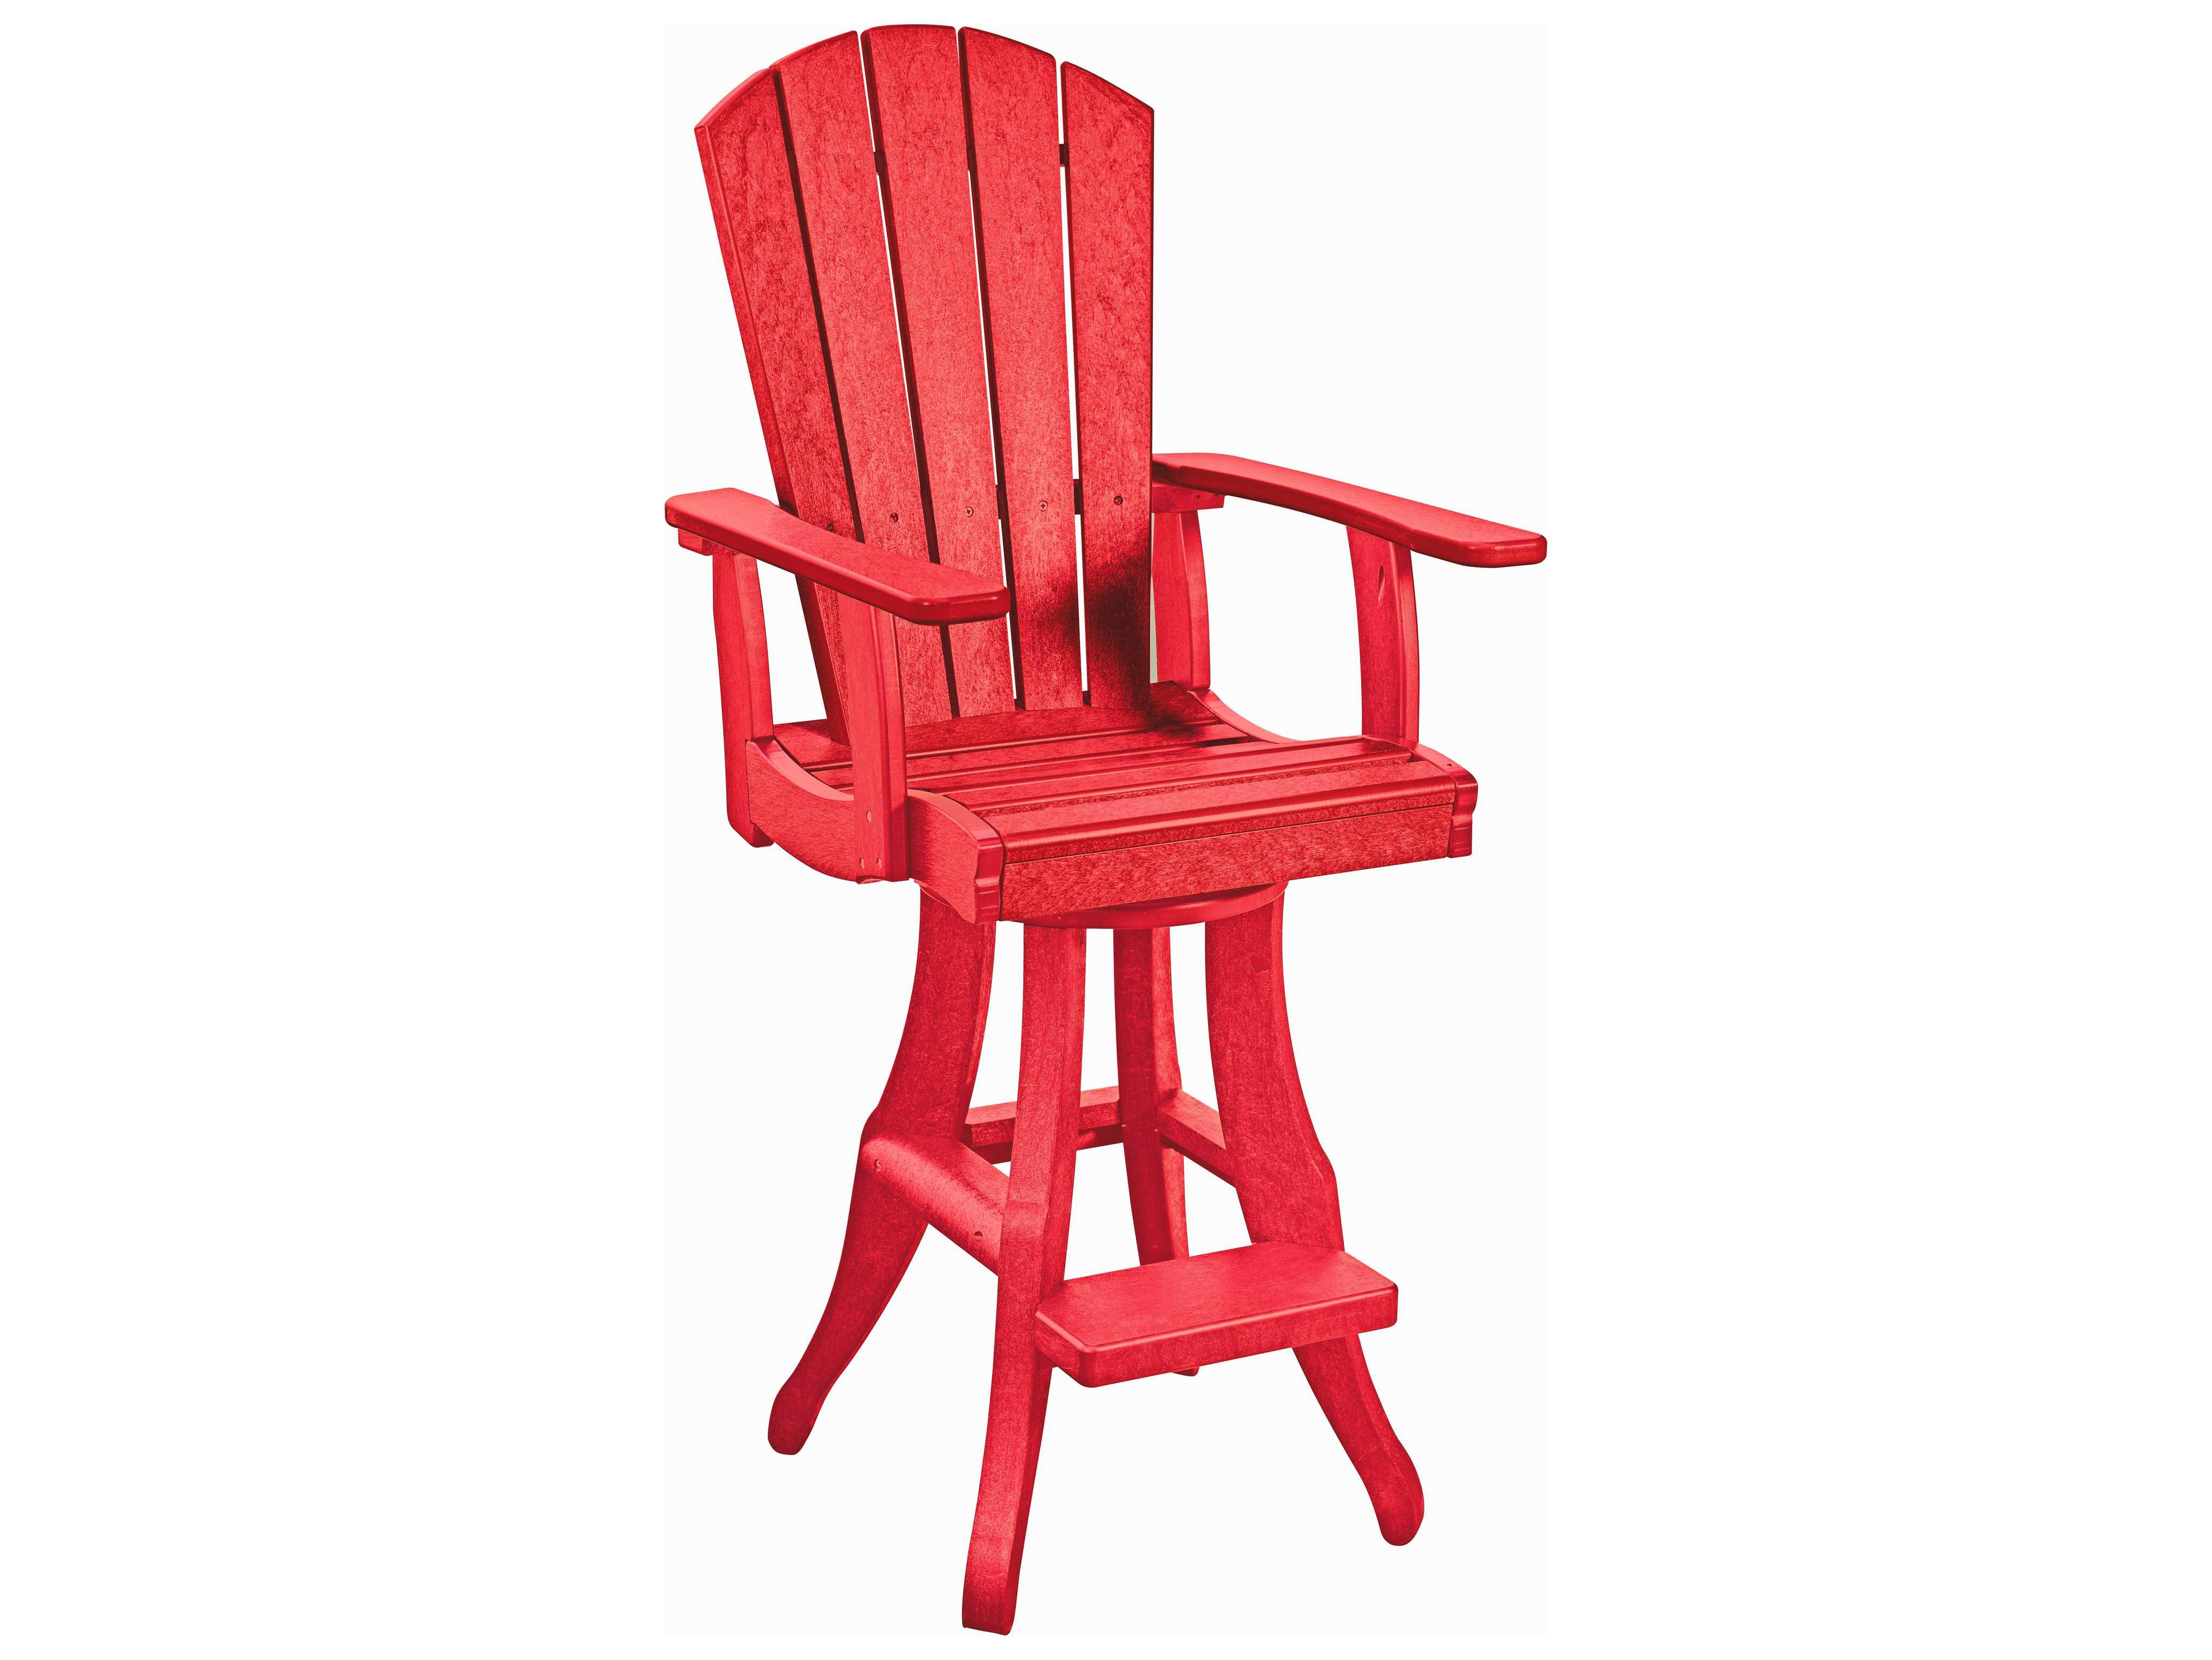 C R Plastic Generation Swivel Arm Pub Chair